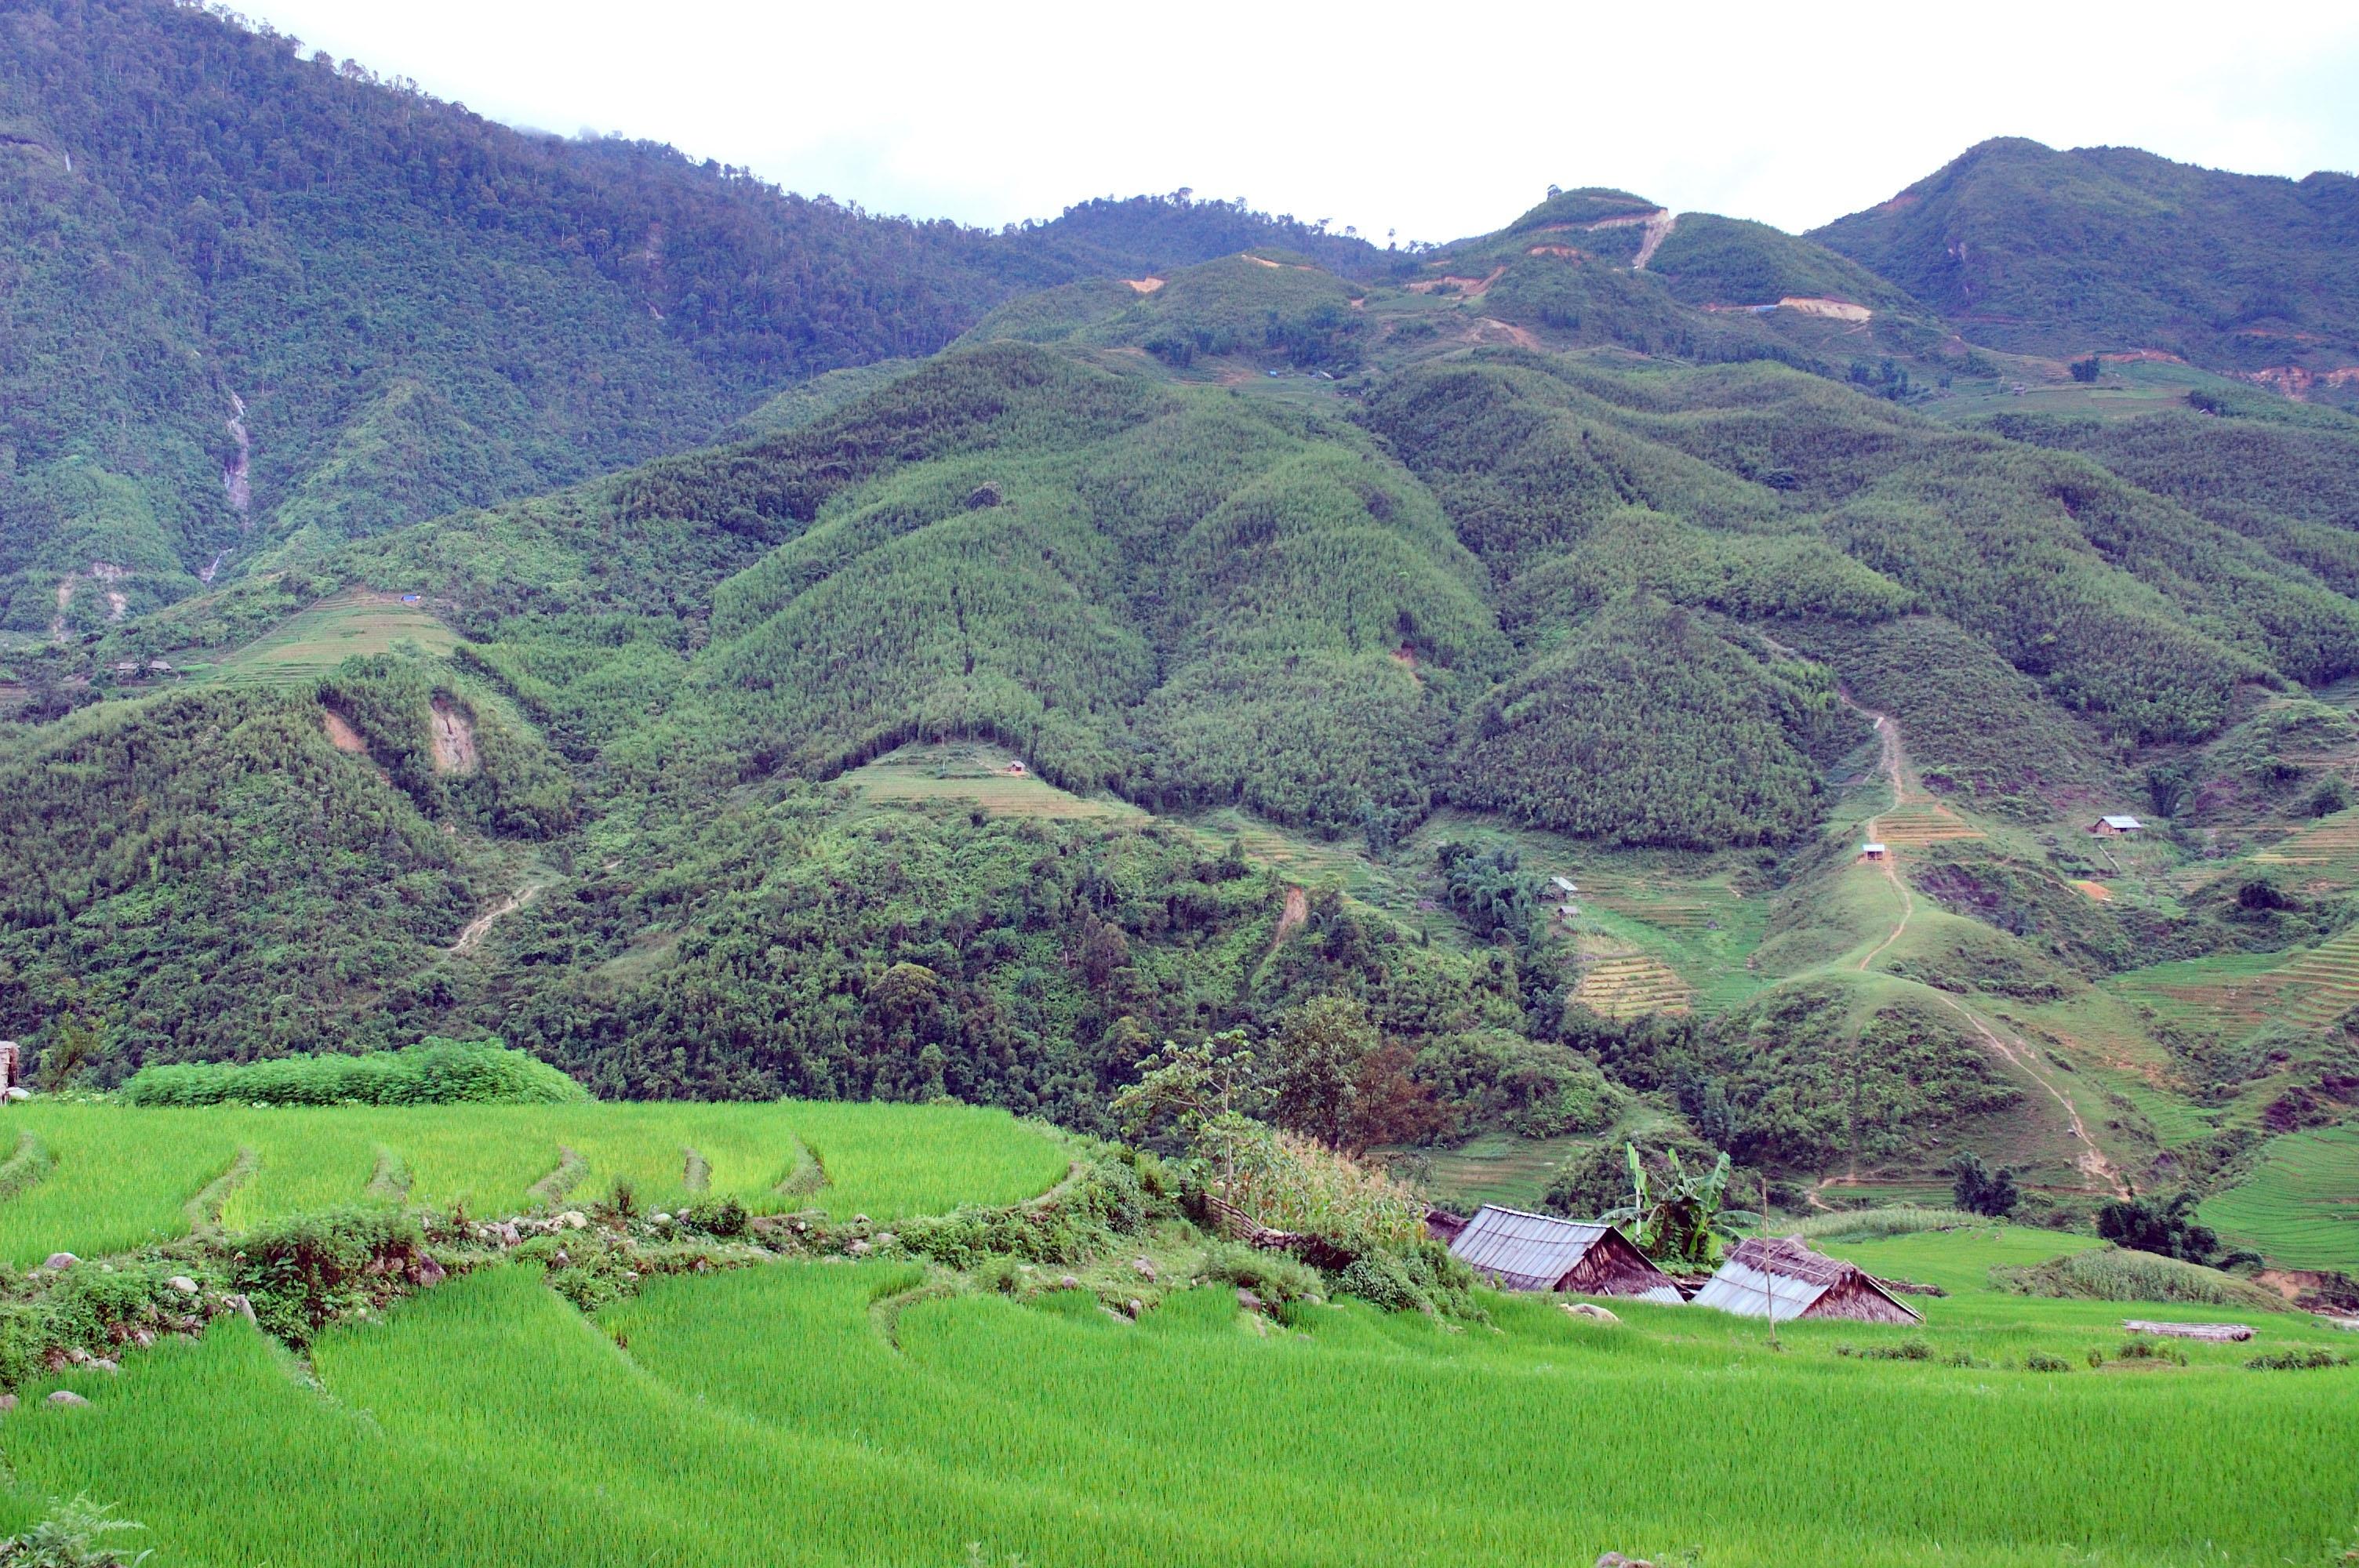 Gambar : pemandangan, bidang, padang rumput, lembah